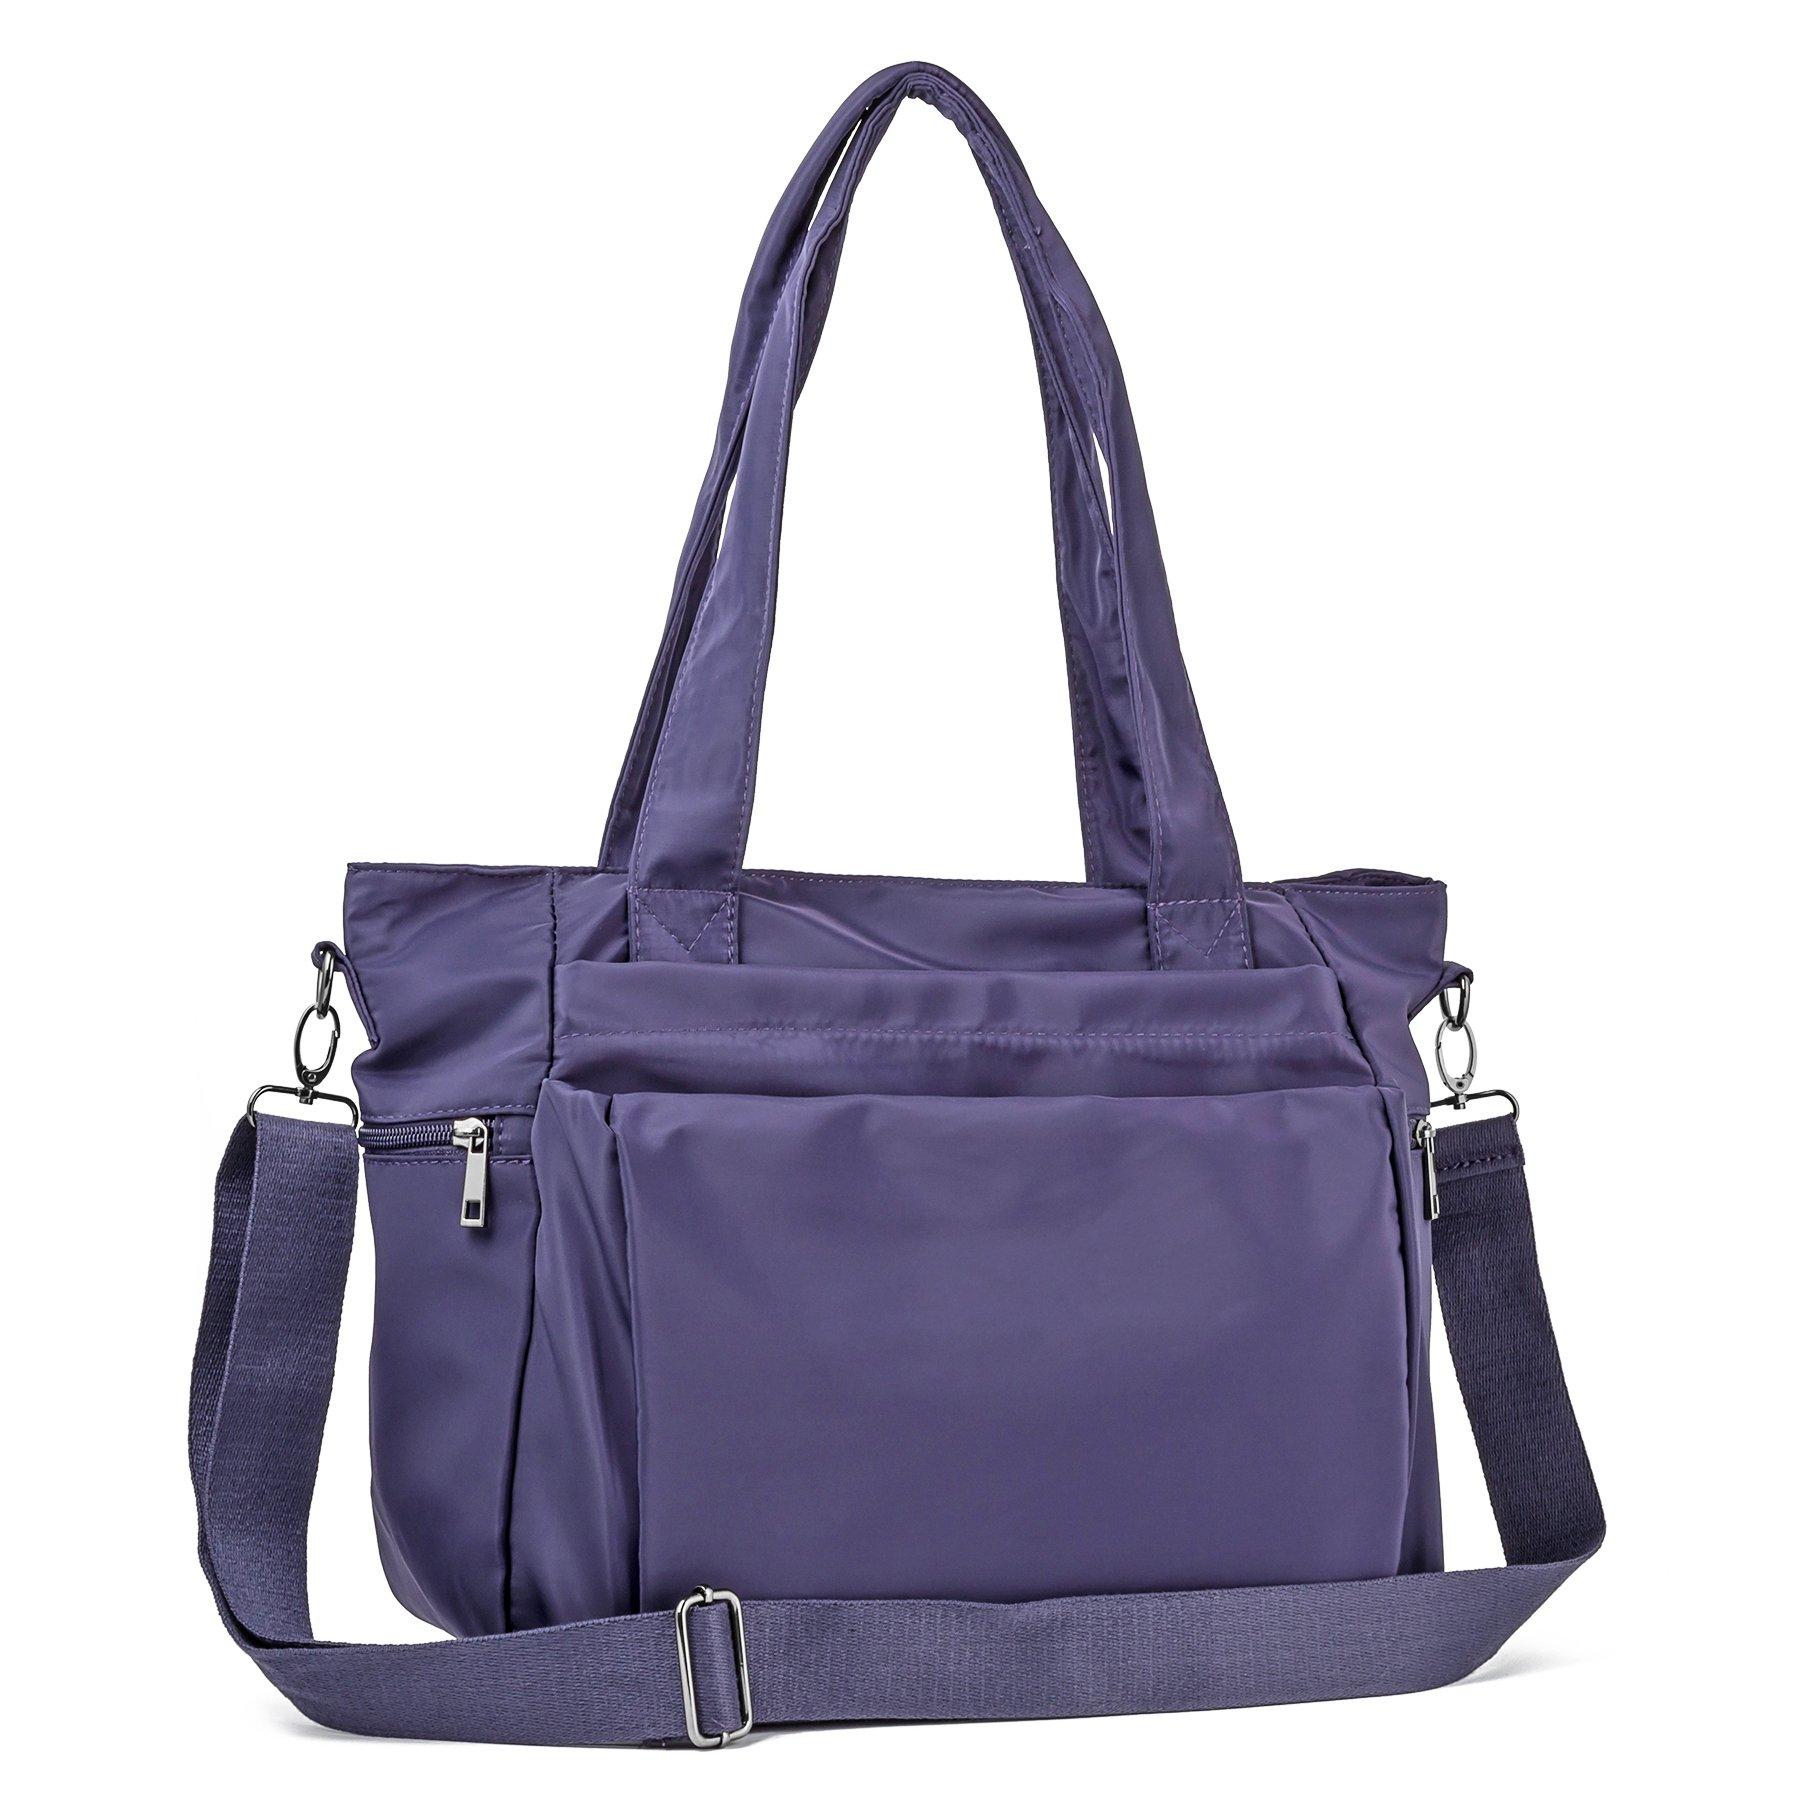 ZORESS Women Fashion Large Tote Shoulder Handbag Waterproof Multi-function Nylon Travel Messenger Bags (Purple)